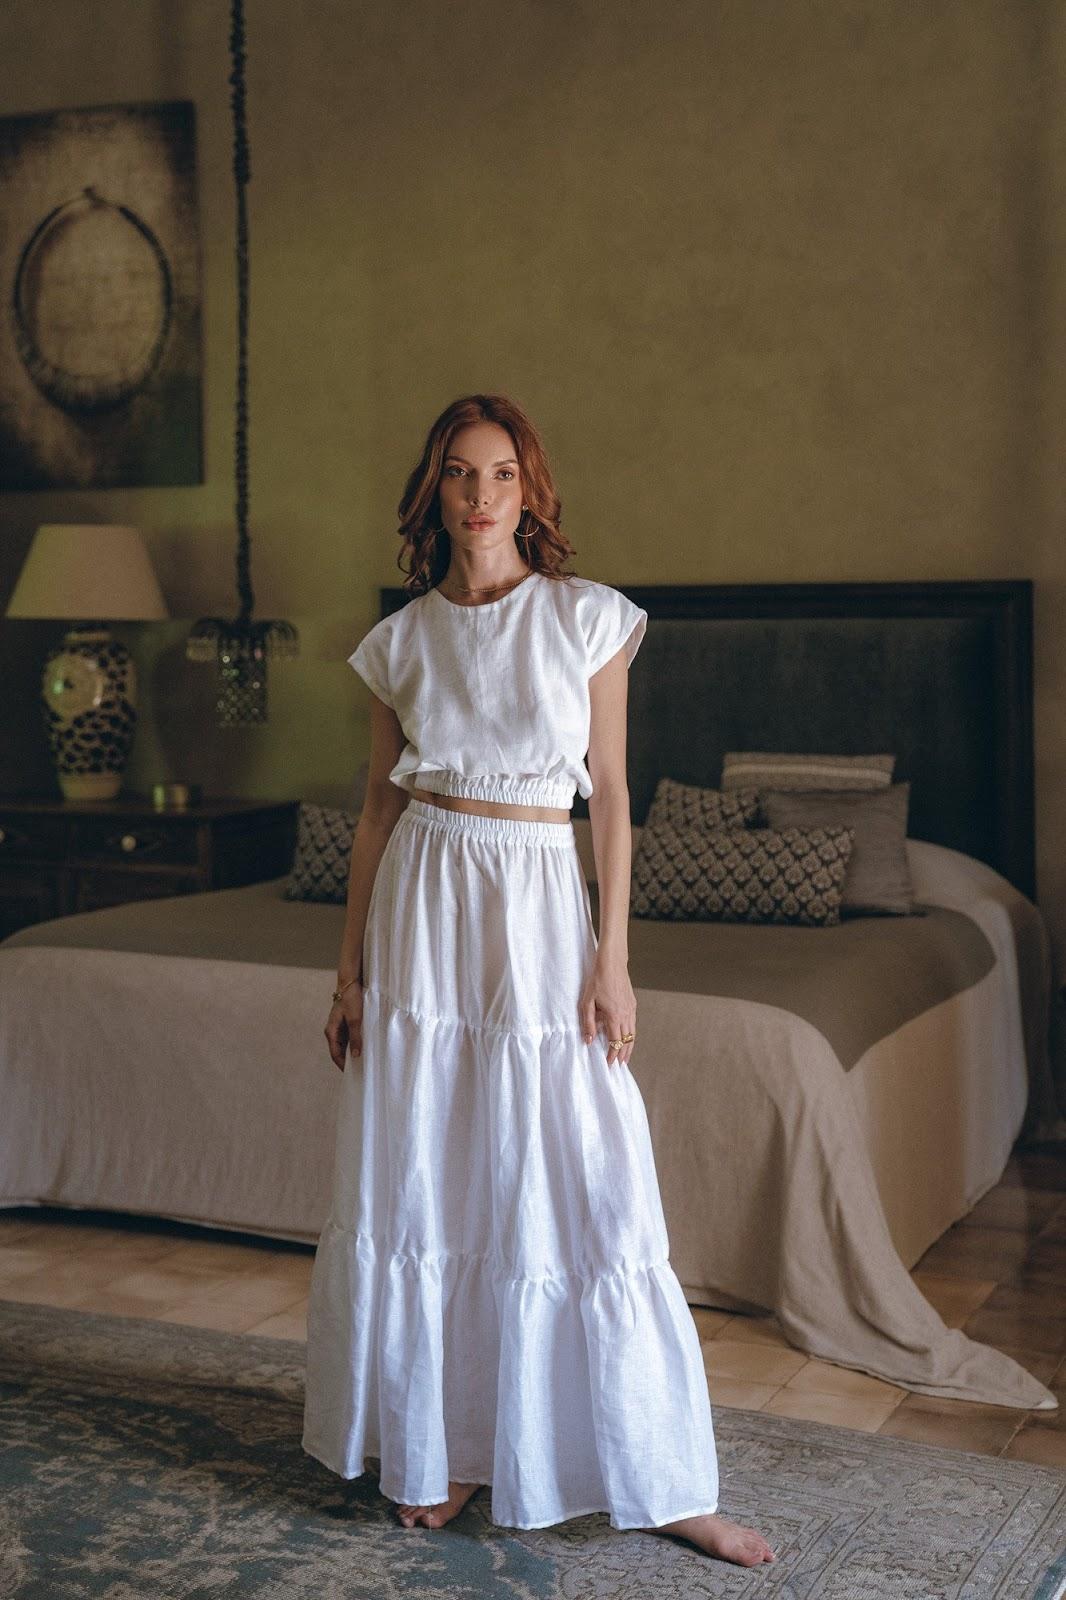 Luna Skirt Set in White, Monaco Pants in Oatmeal, Roma Top in Oatmeal